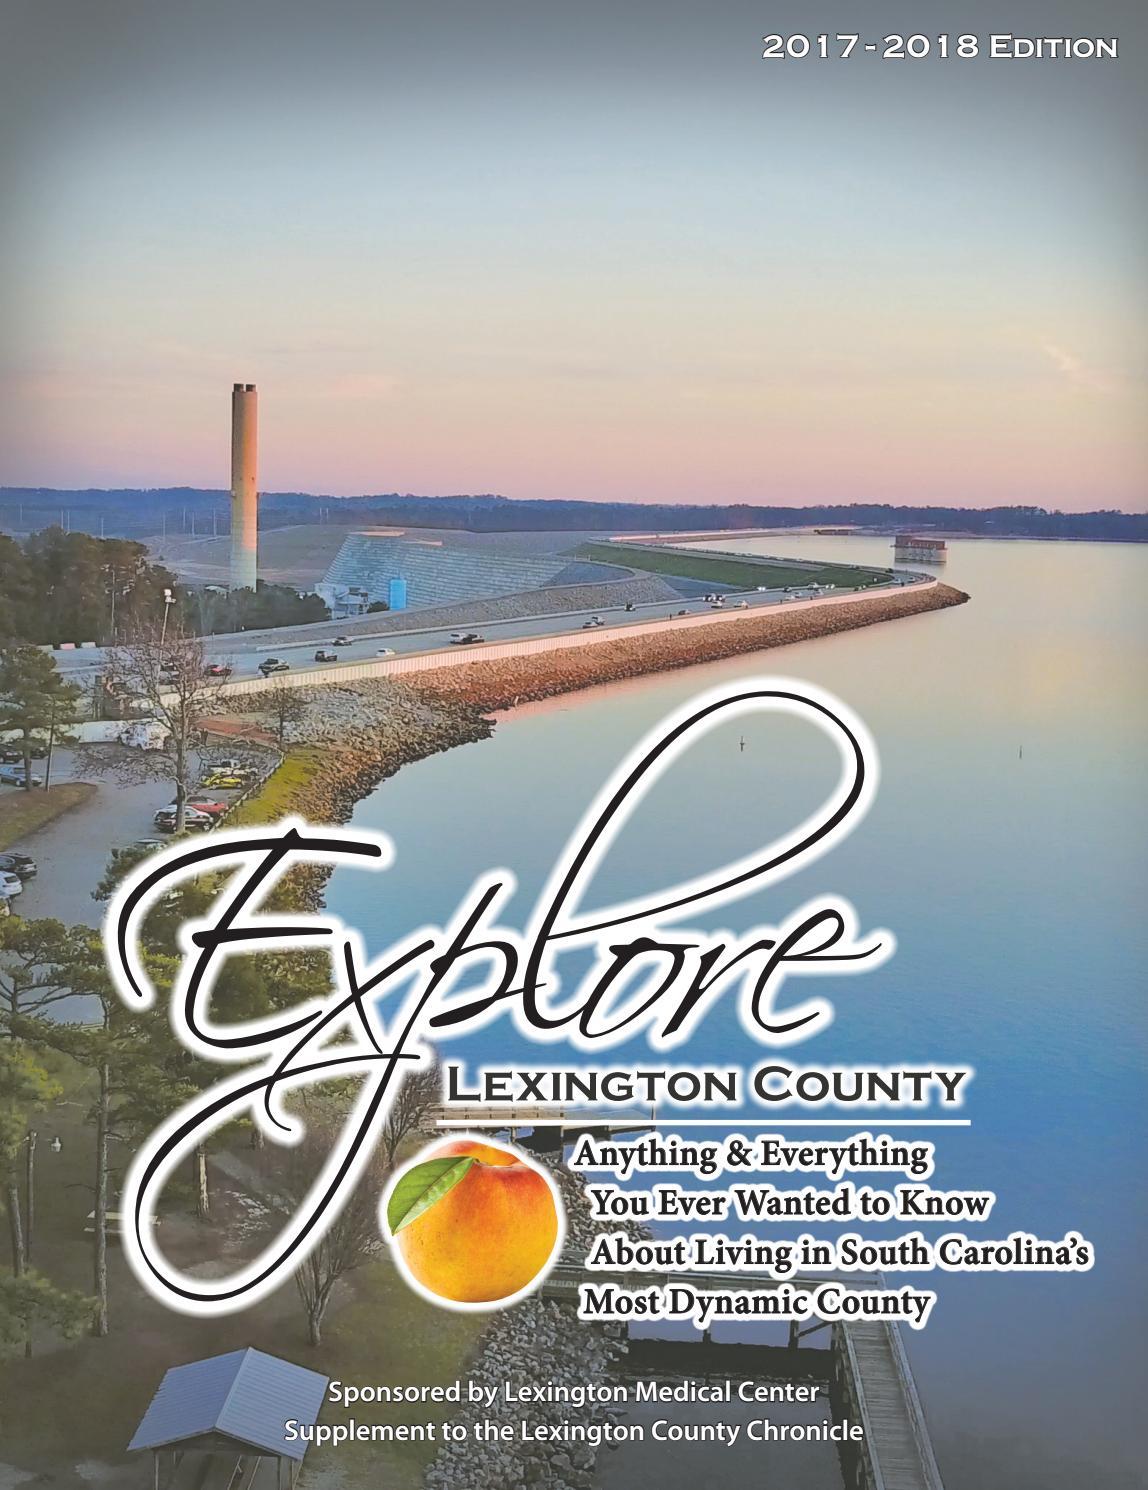 2017 Explore Lexington County Guide by Lexington Chronicle - issuu